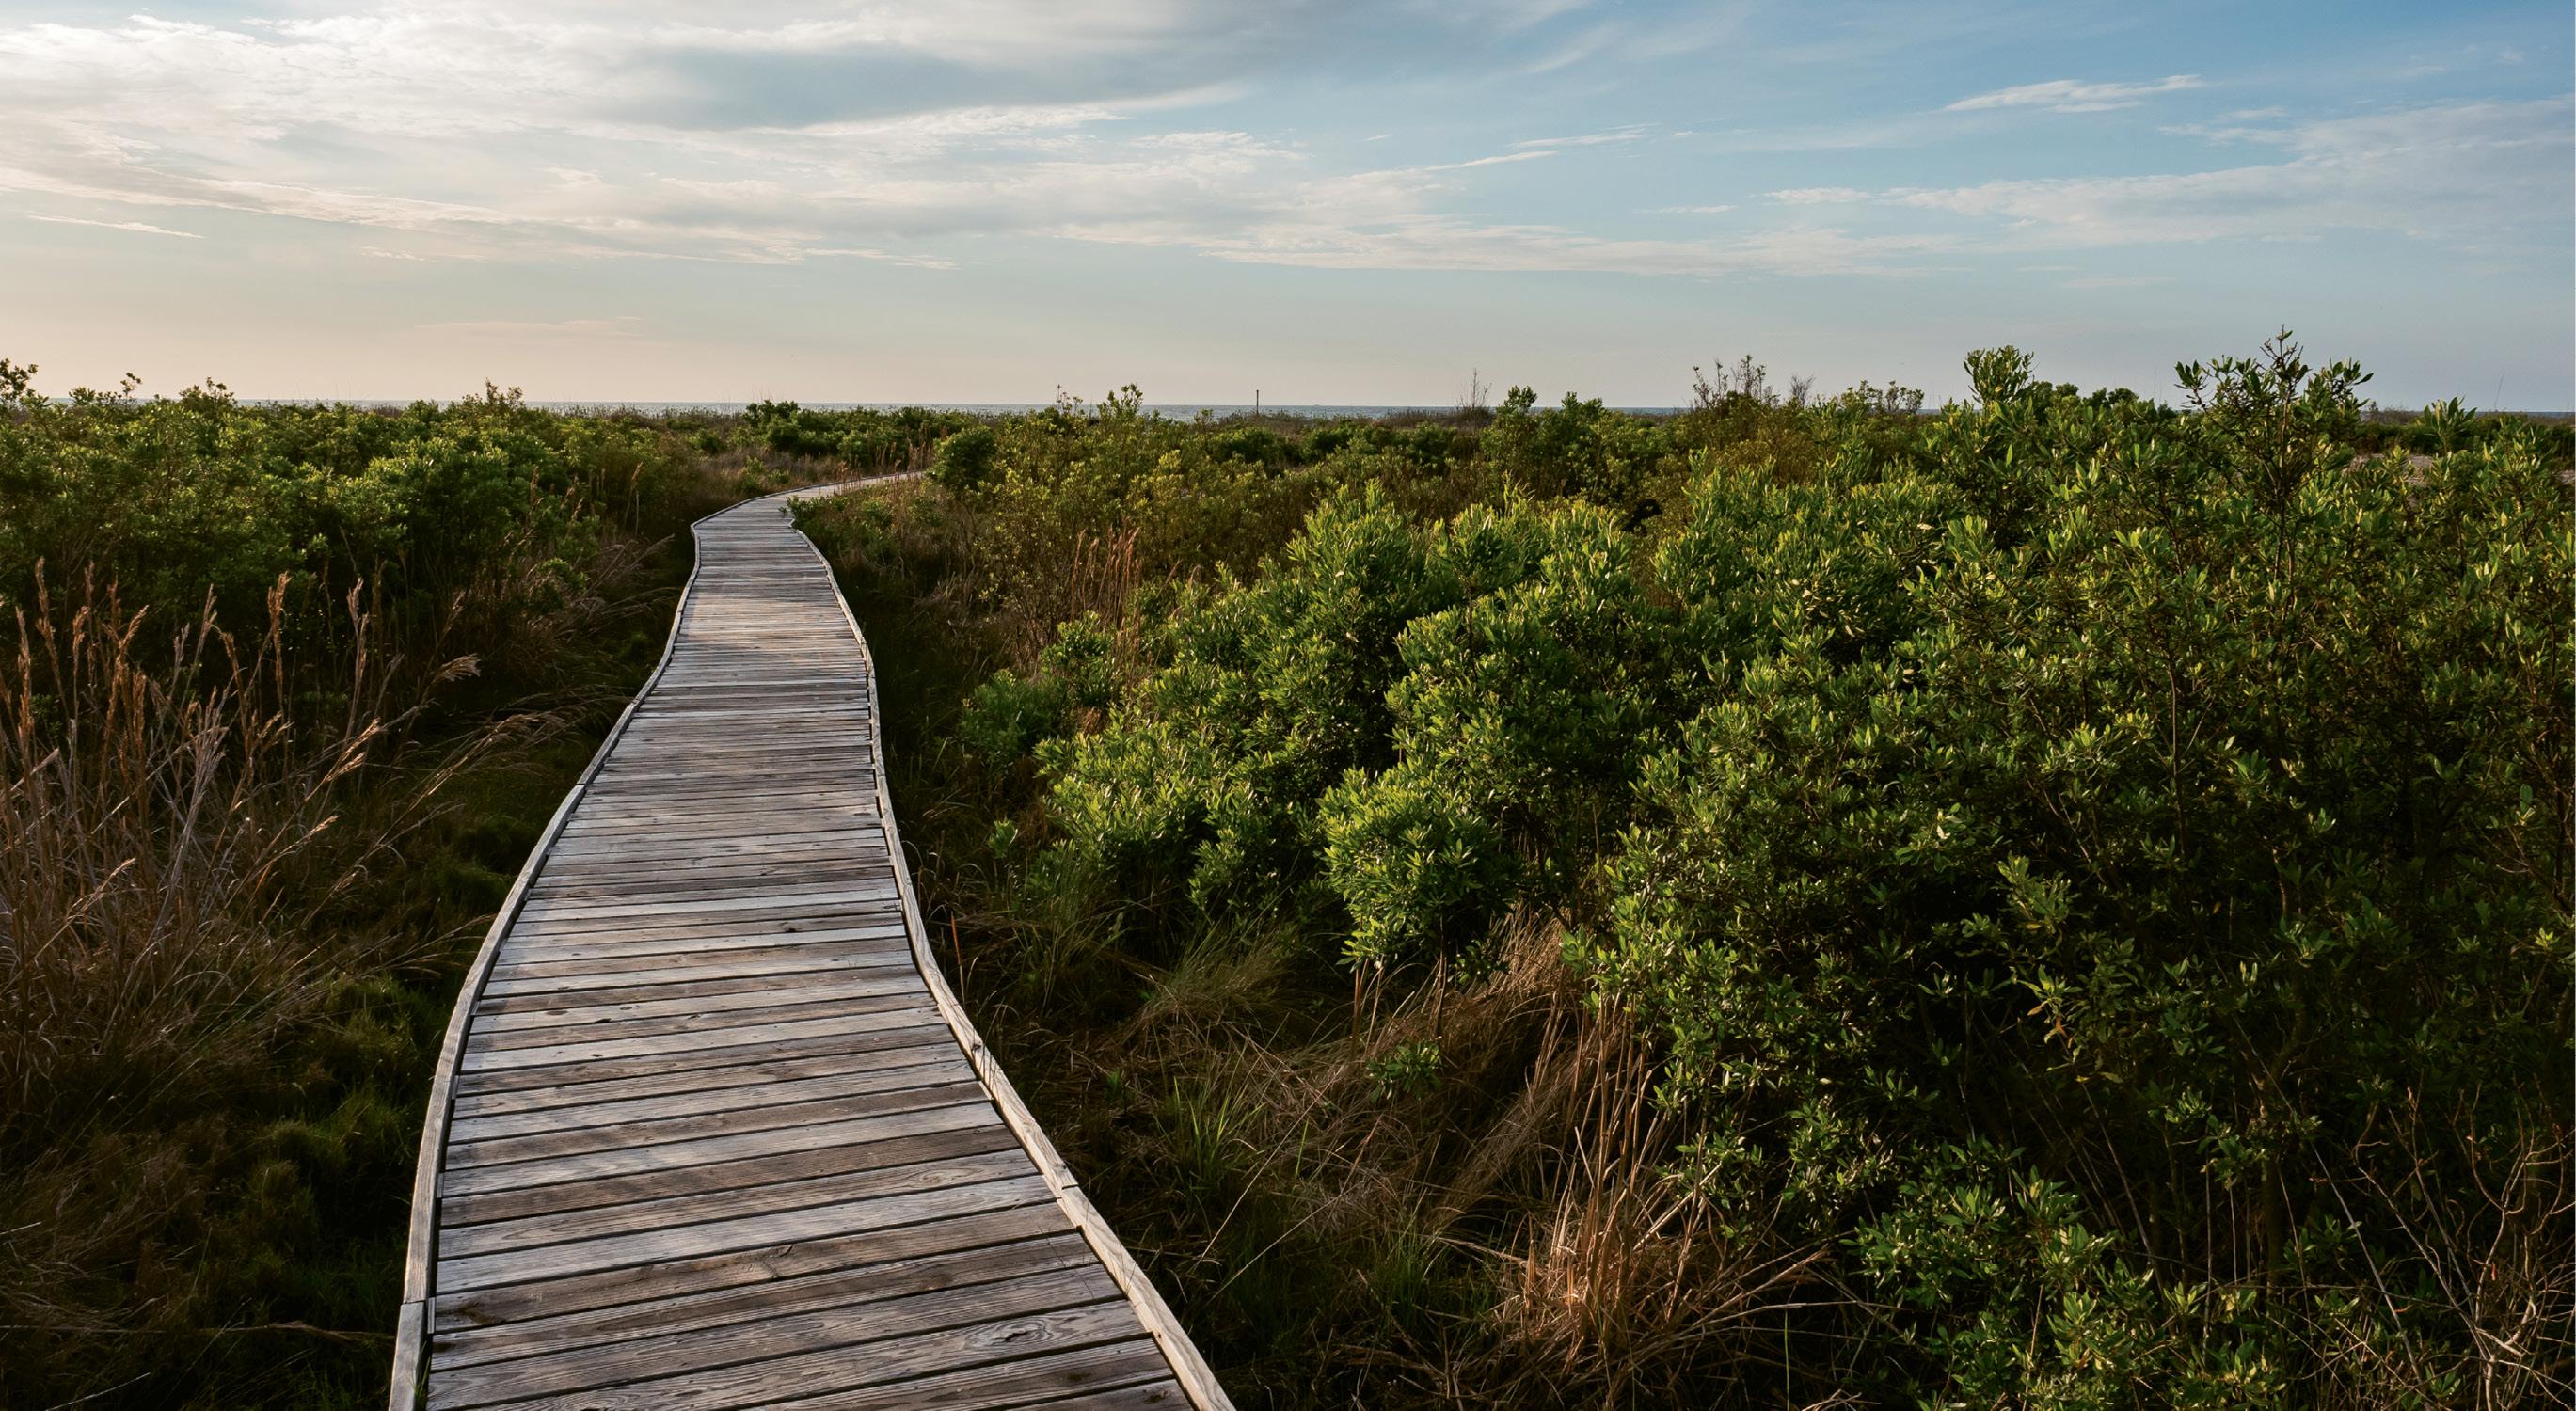 The beach boardwalk.